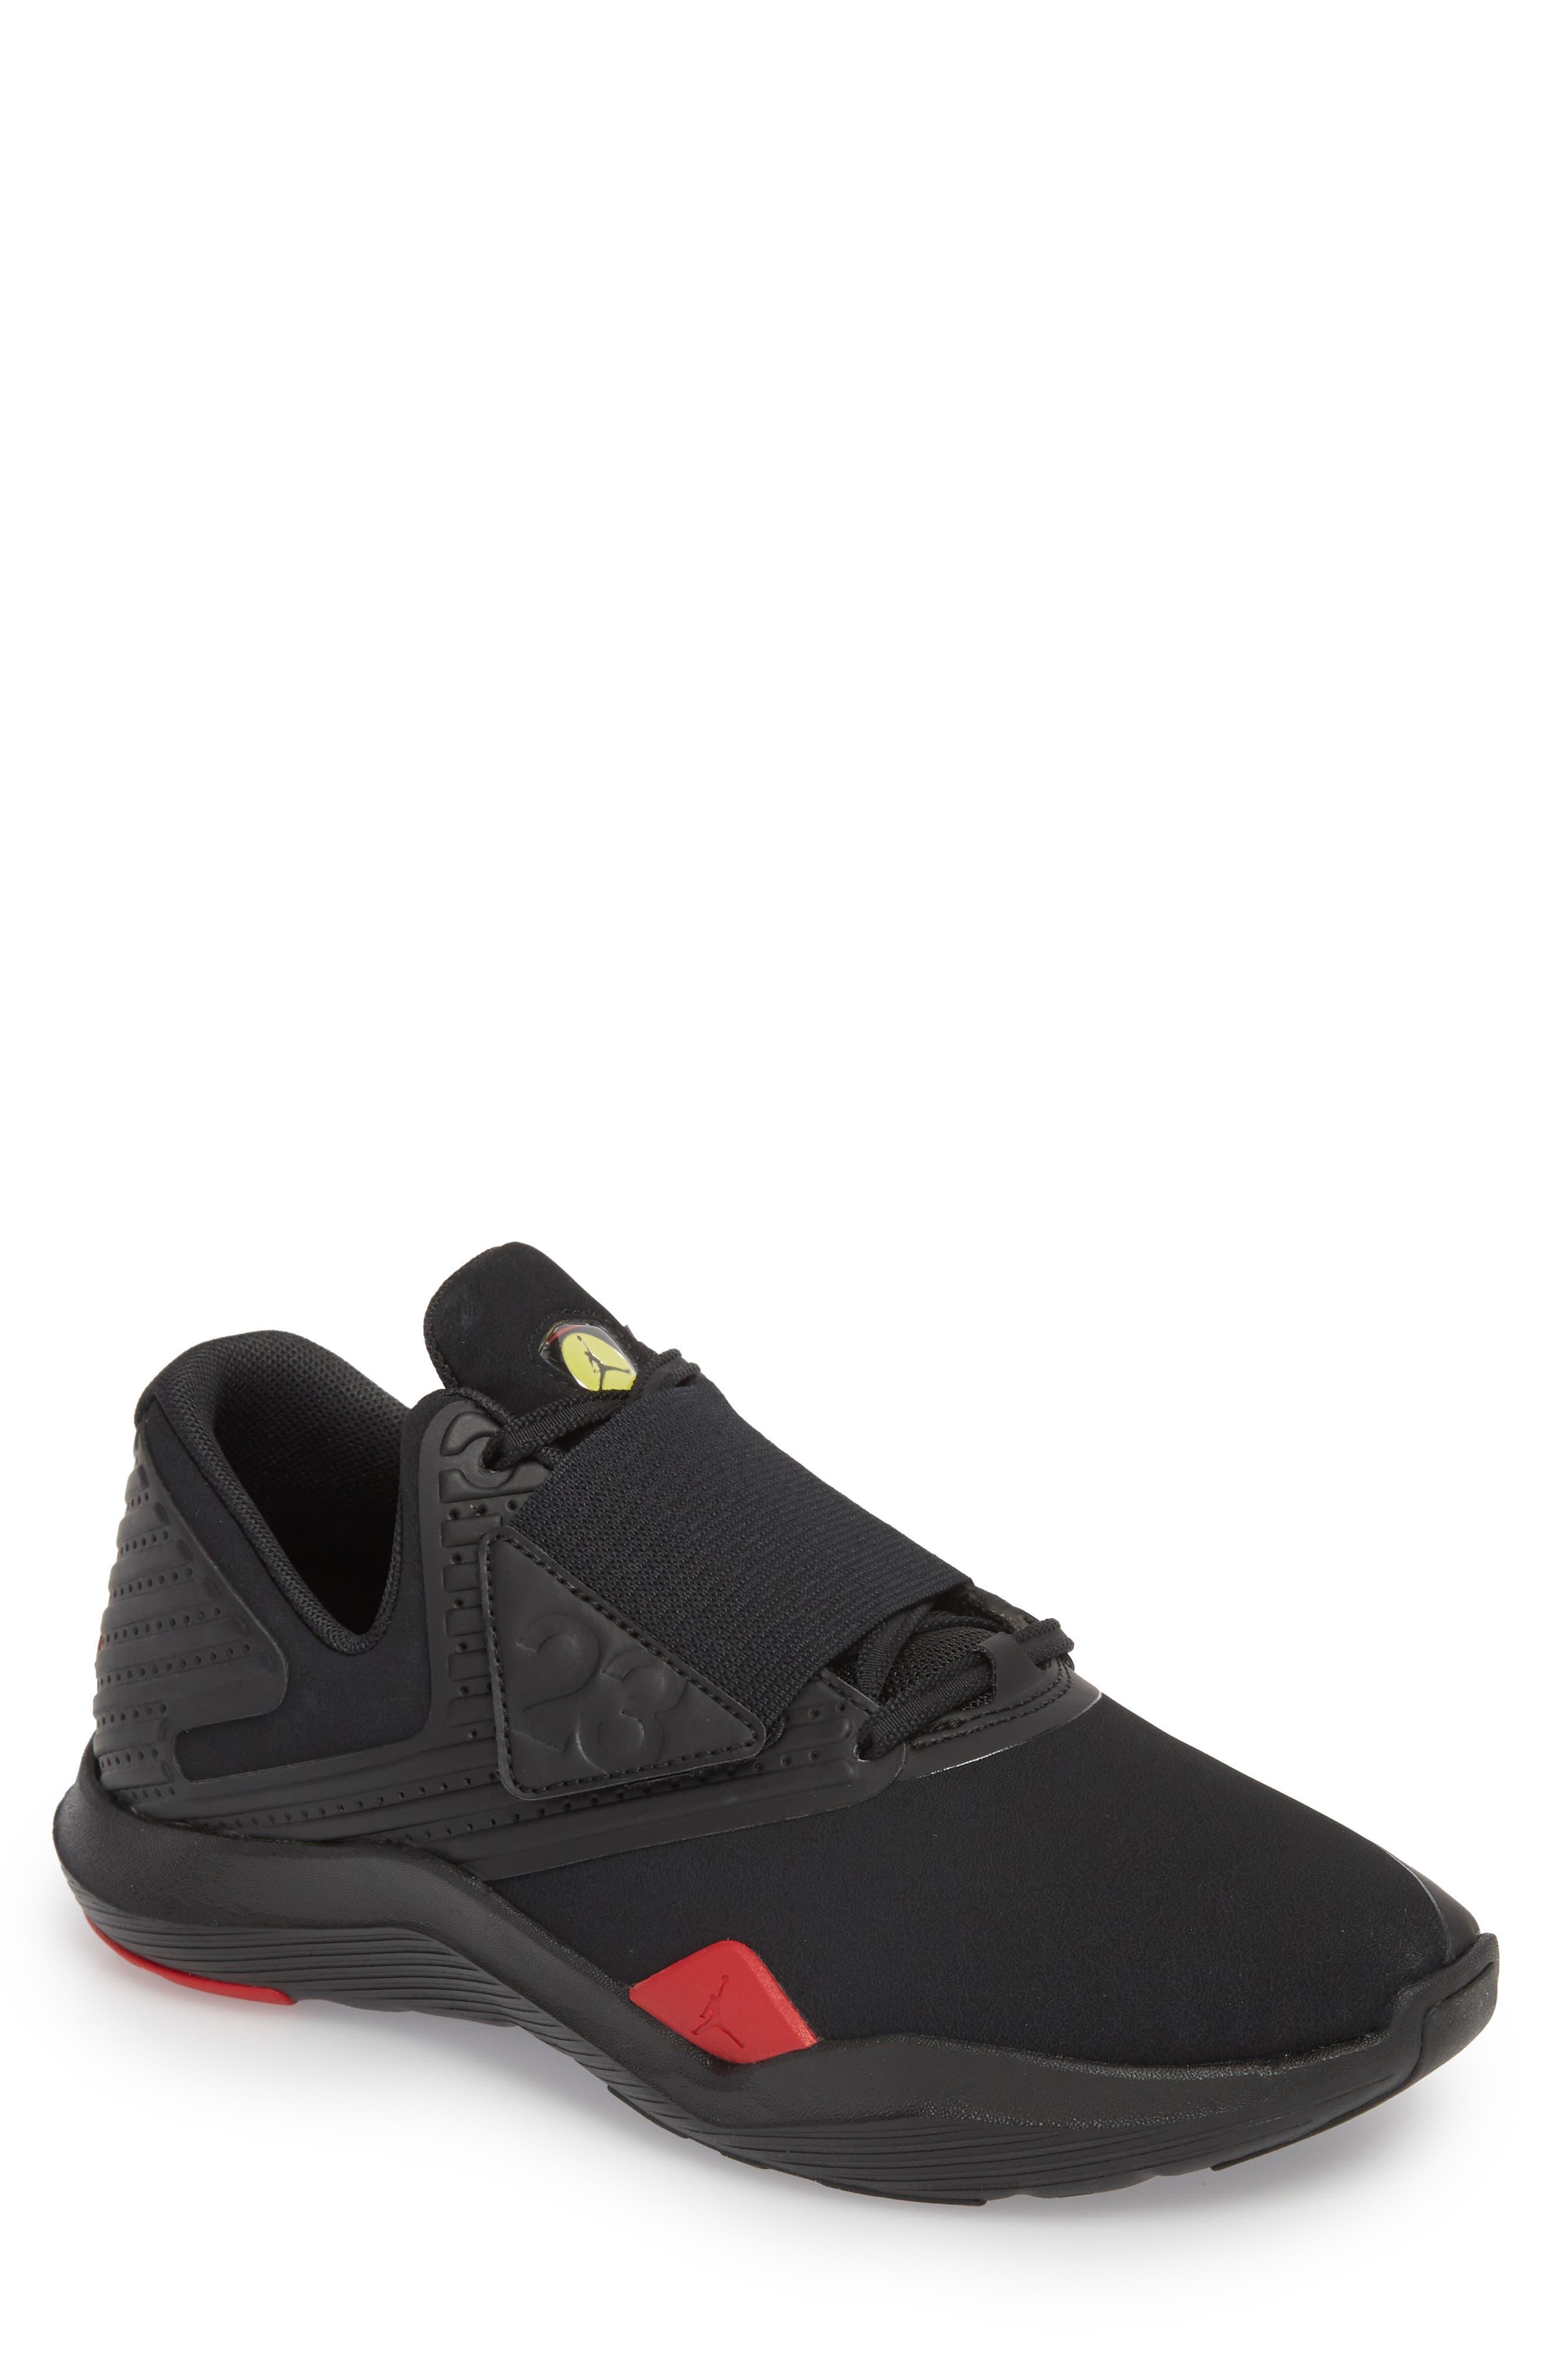 Nike Air Jordan Relentless Training